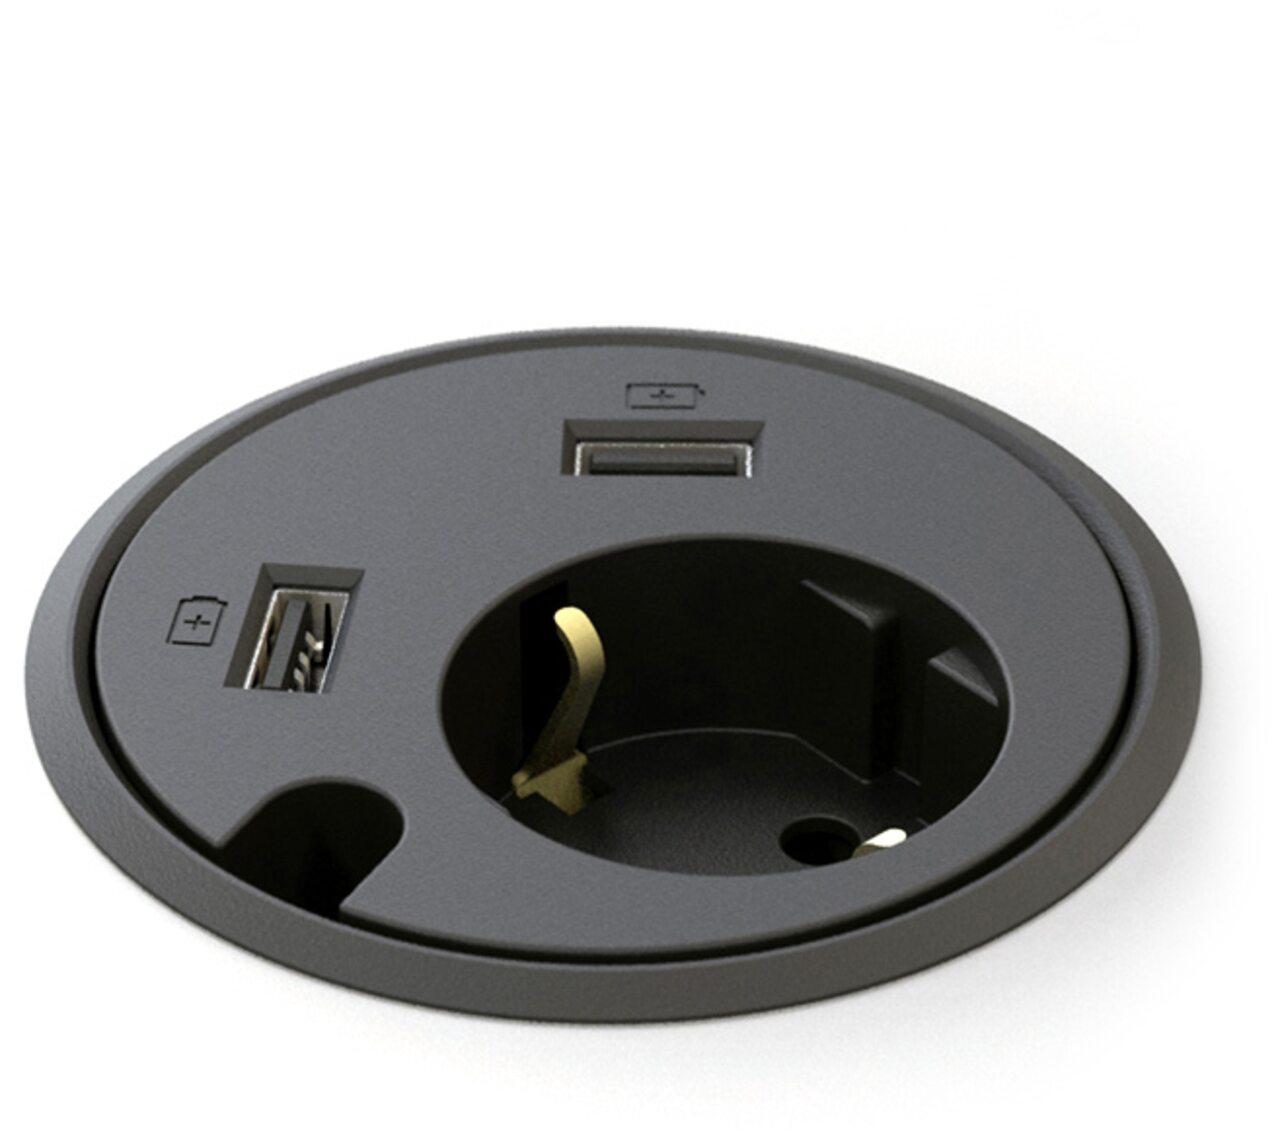 Заглушка Power Dot 1 Power 2 x USB-ch Exe  - фото 1